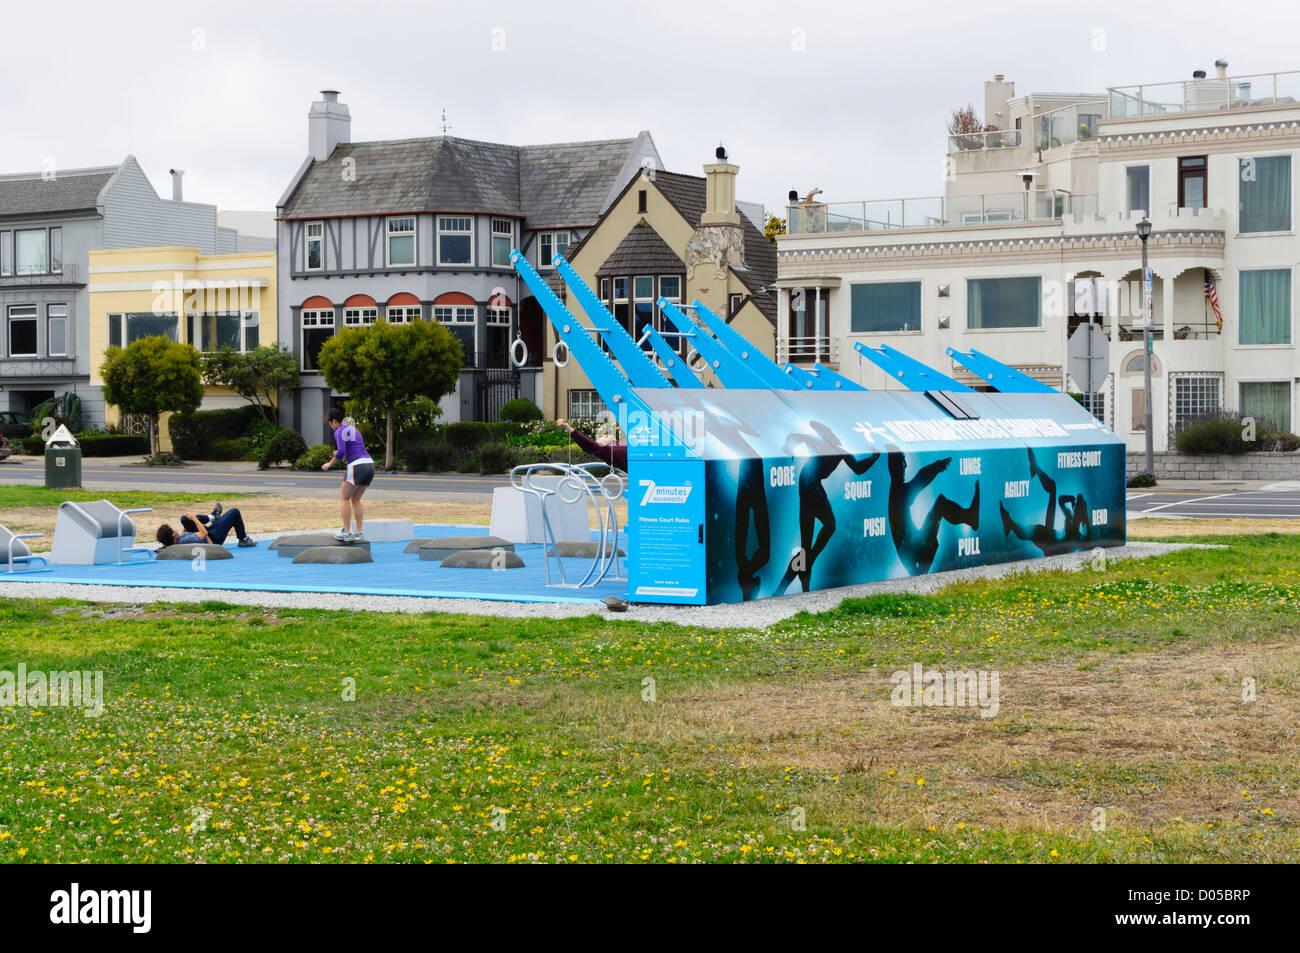 San Francisco - comunidad público tribunal de fitness en zona marina Boulevard. Imagen De Stock